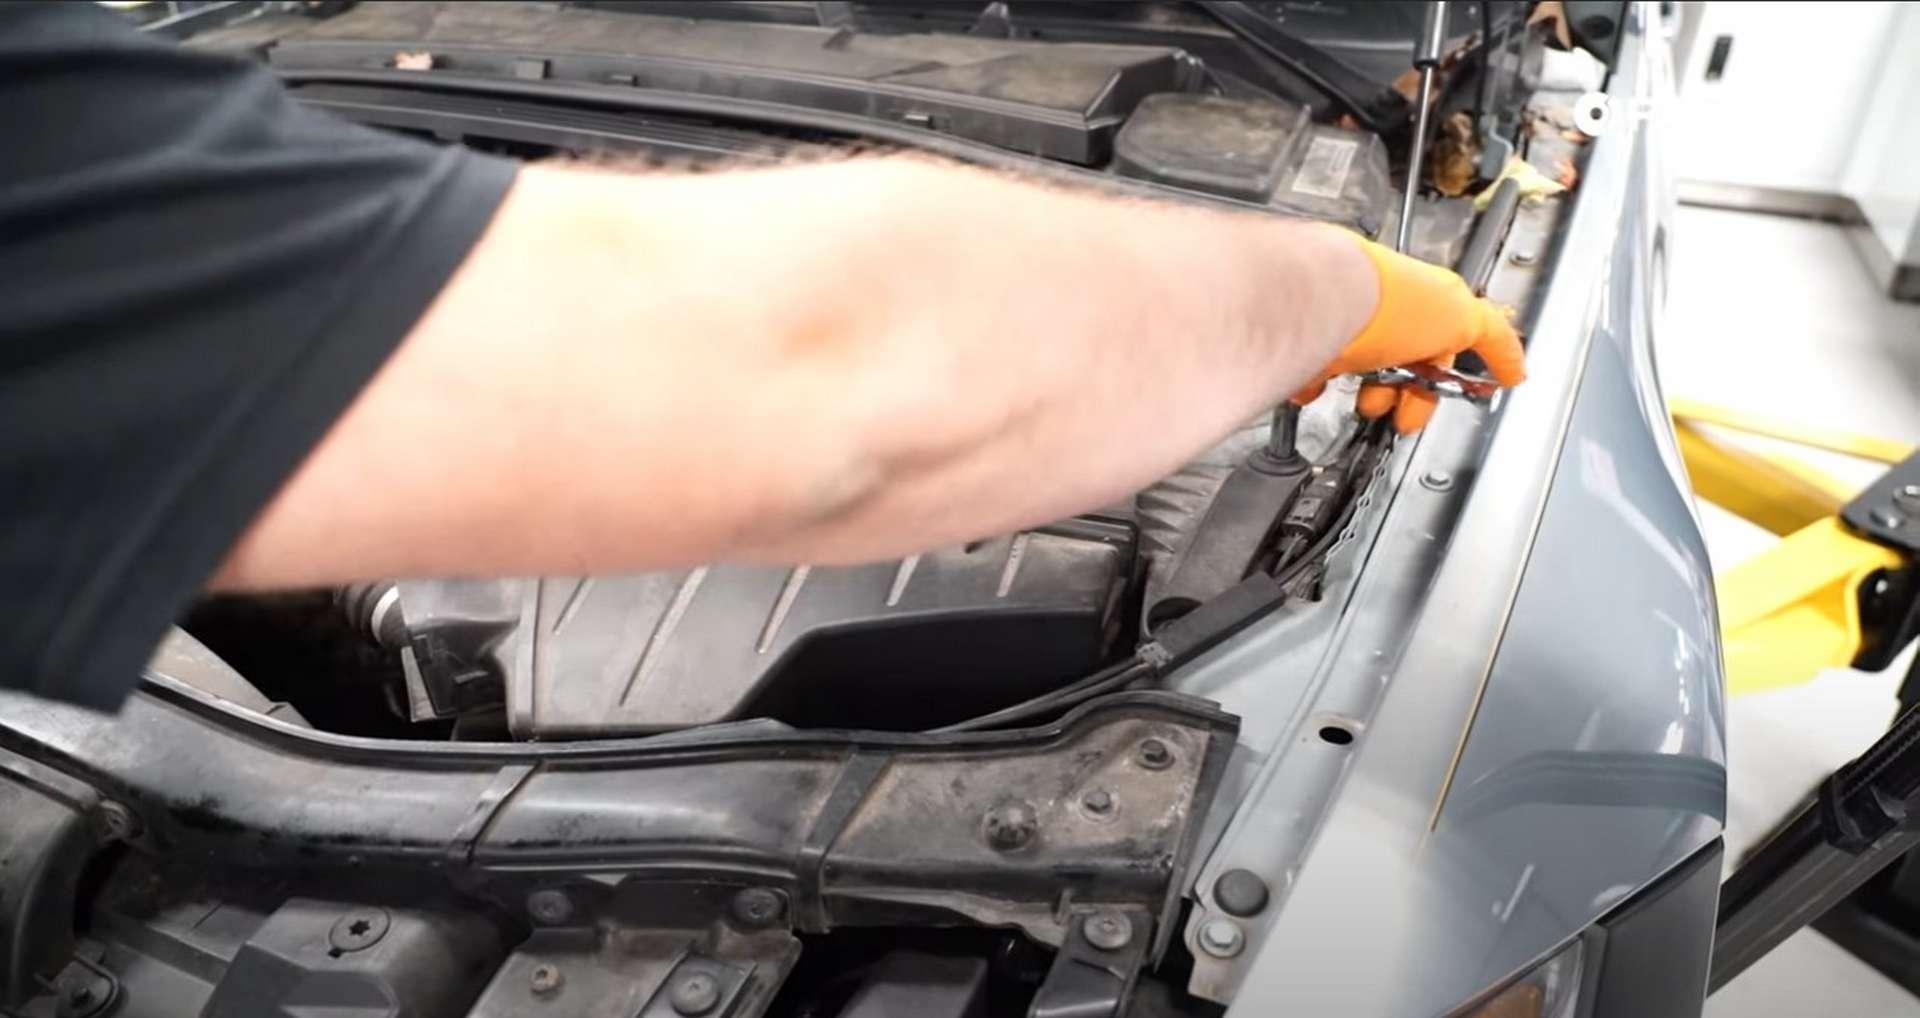 DIY BMW N52 Drive Belt Replacement removing the intake snorkel